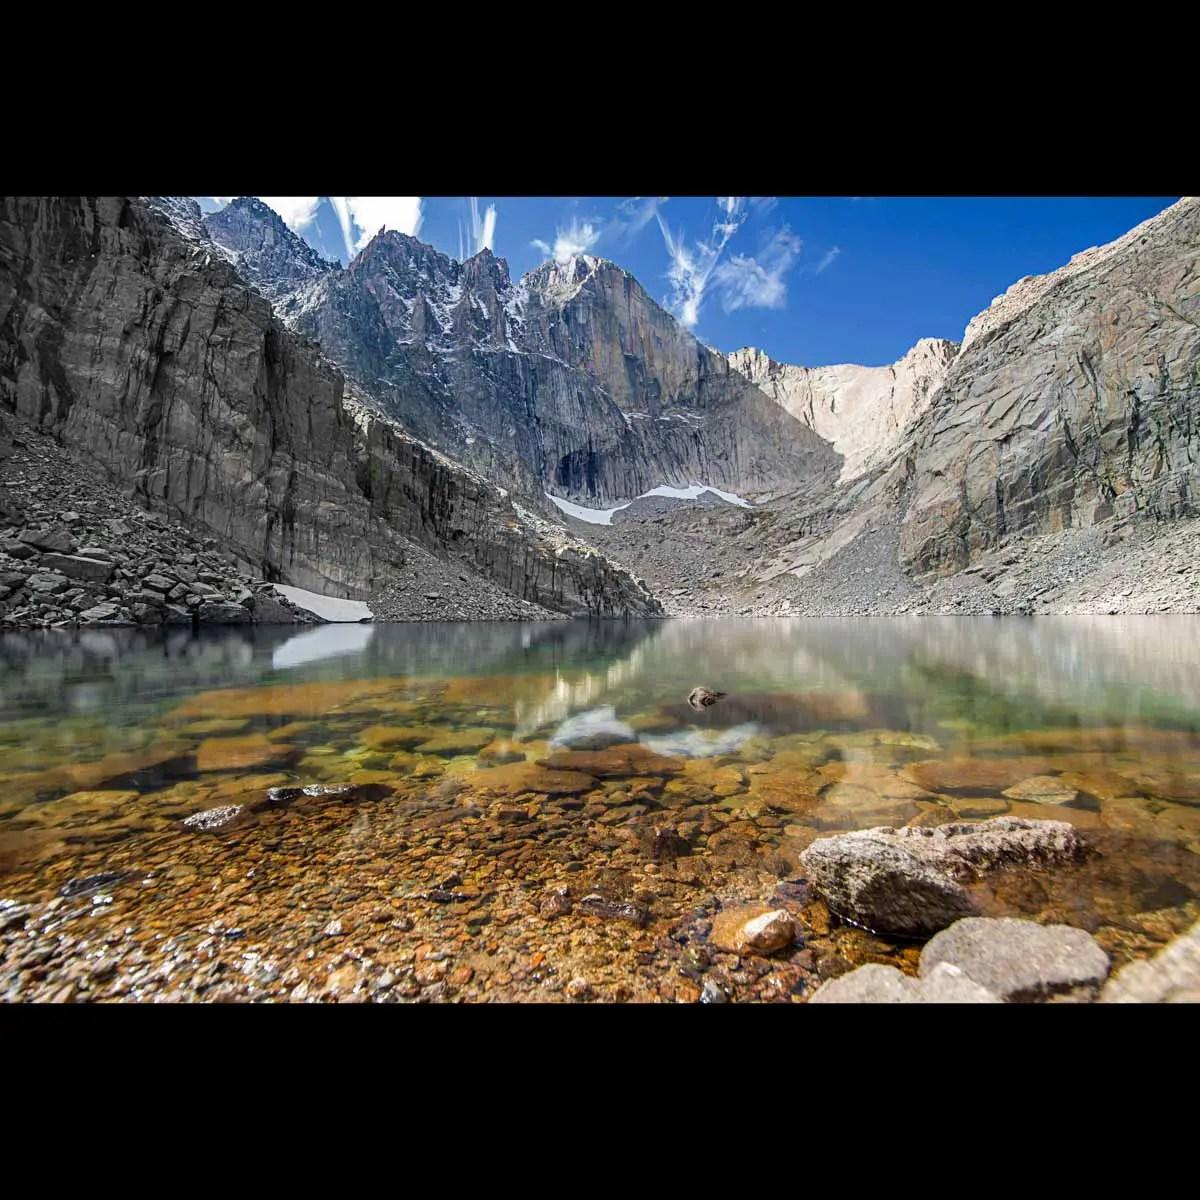 David Hancock - Chasm Lake